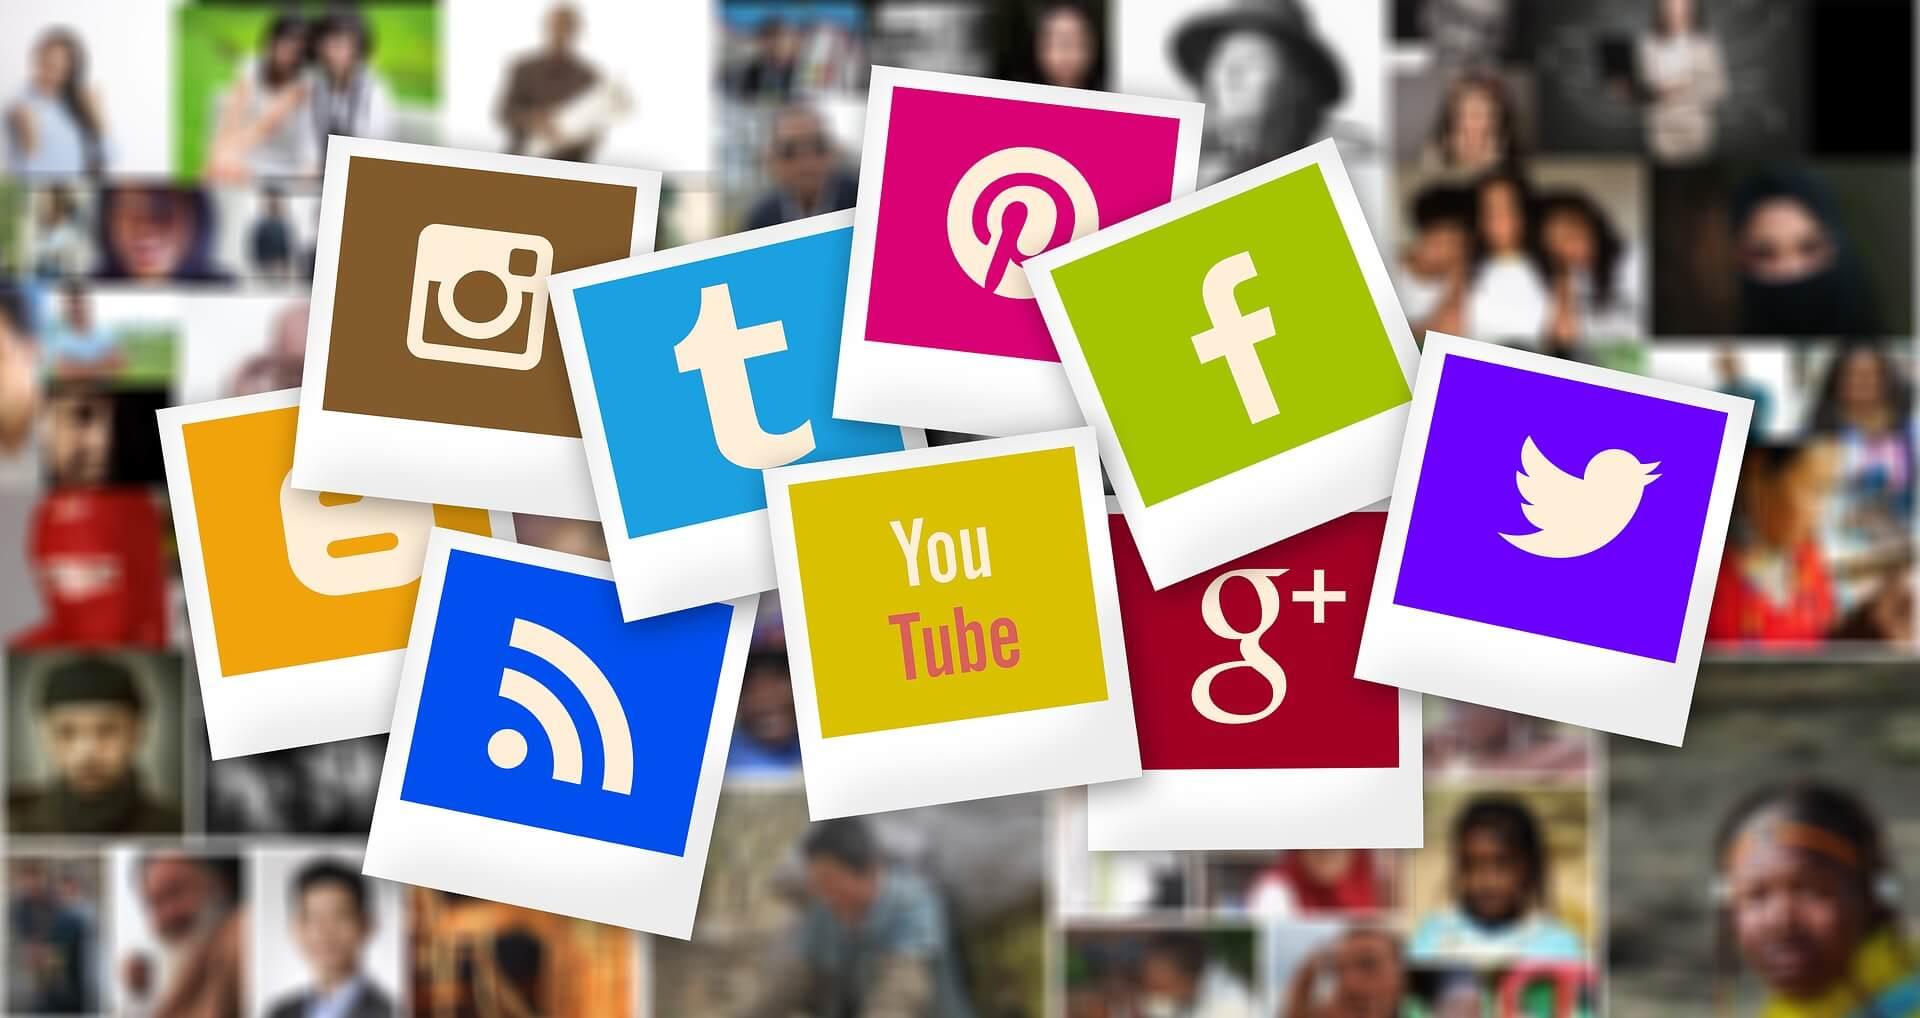 Polaroidova ikona Digitalni Marketing Za Družbene Medije